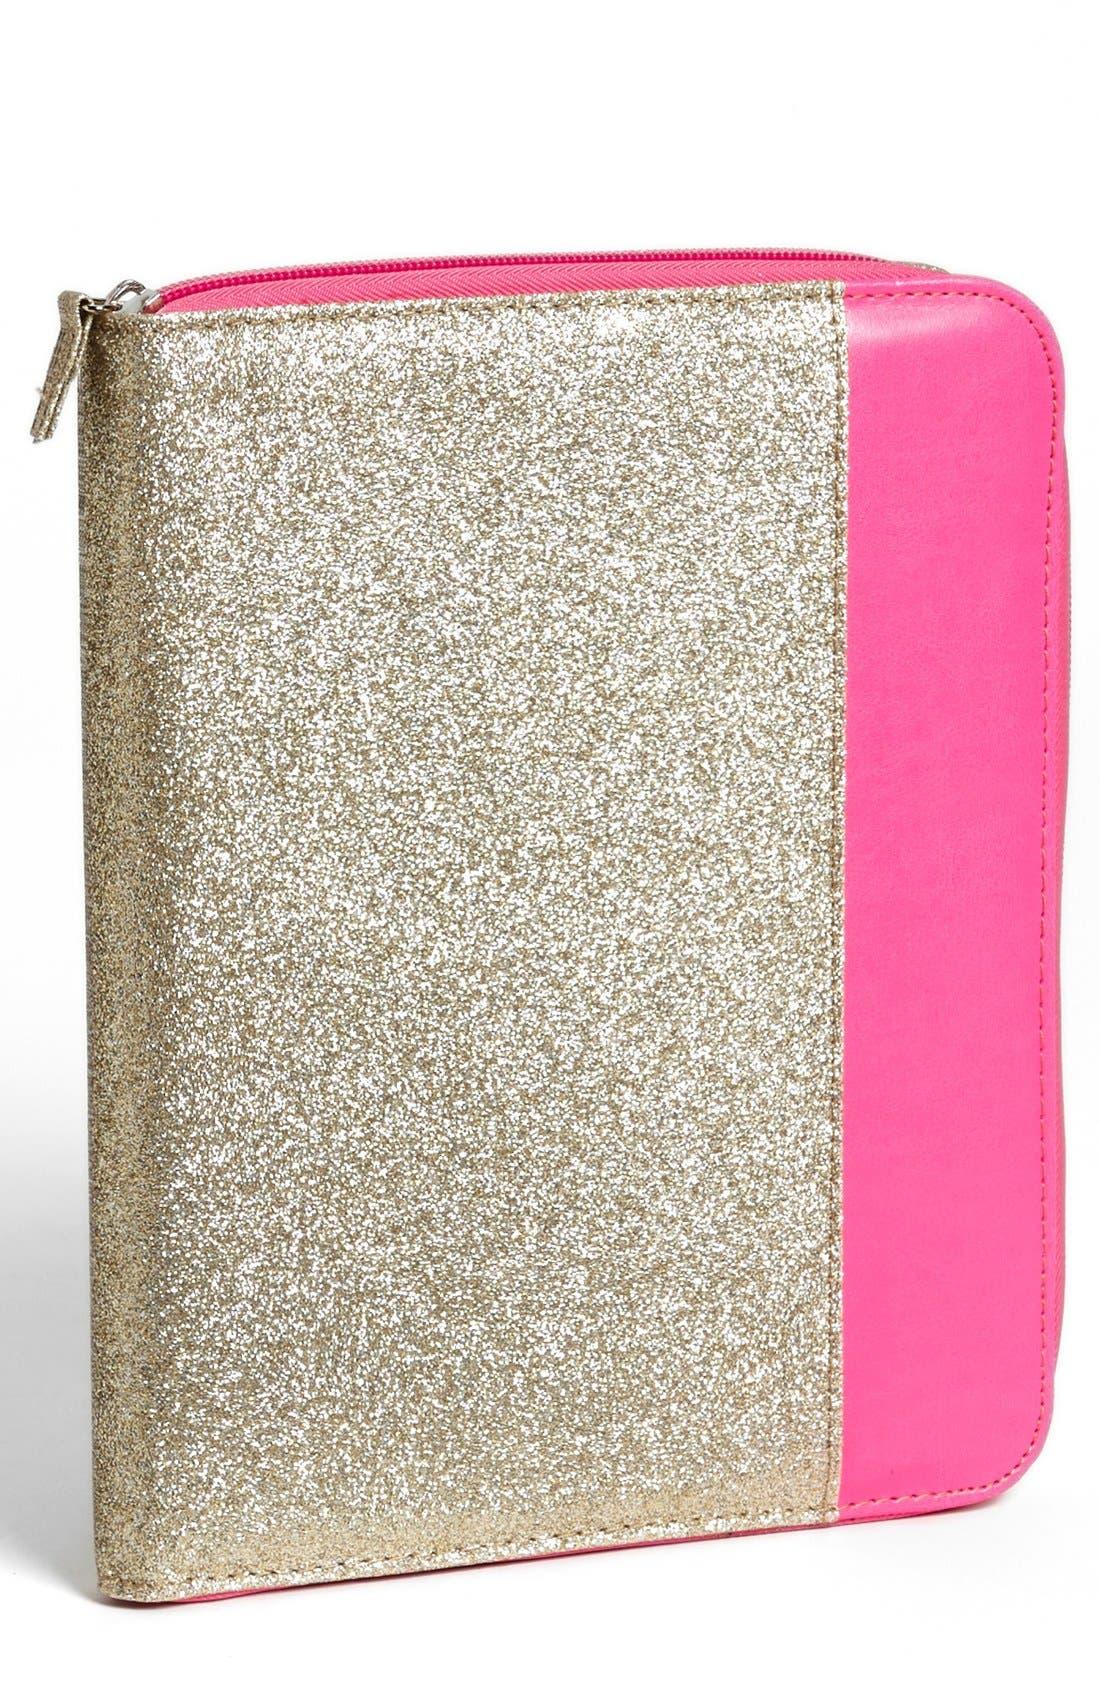 Main Image - Capelli of New York iPad Case (Girls)